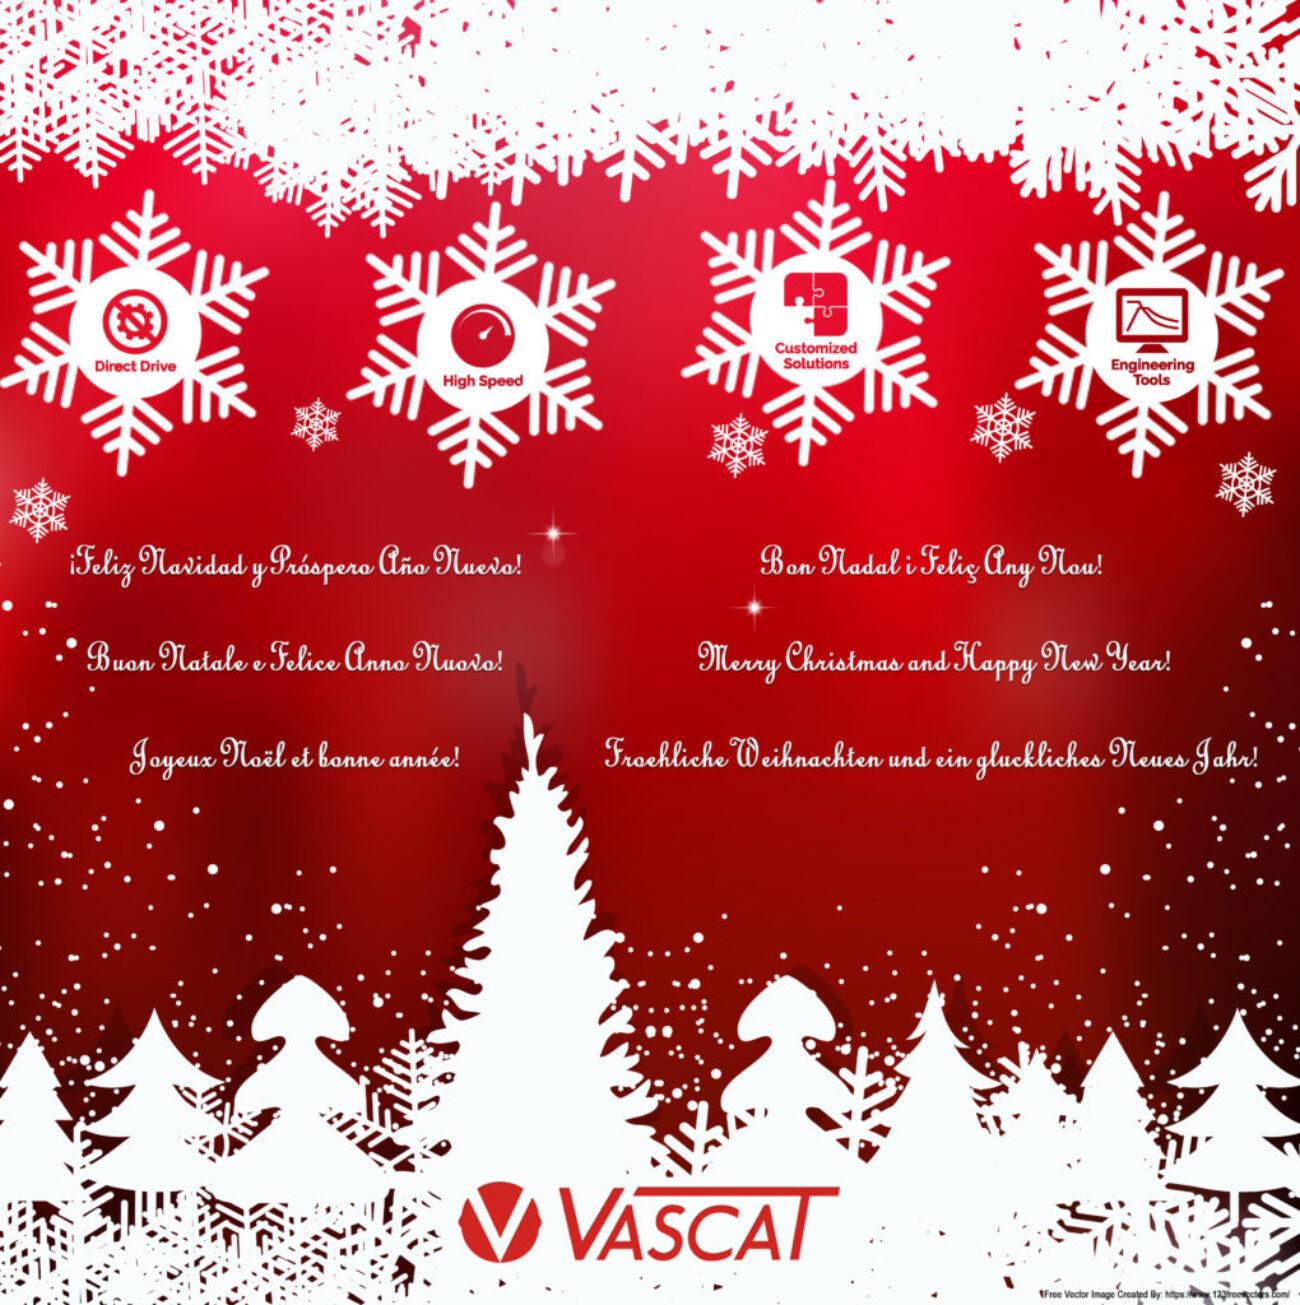 VASCAT_Nadala2017-1020x1024